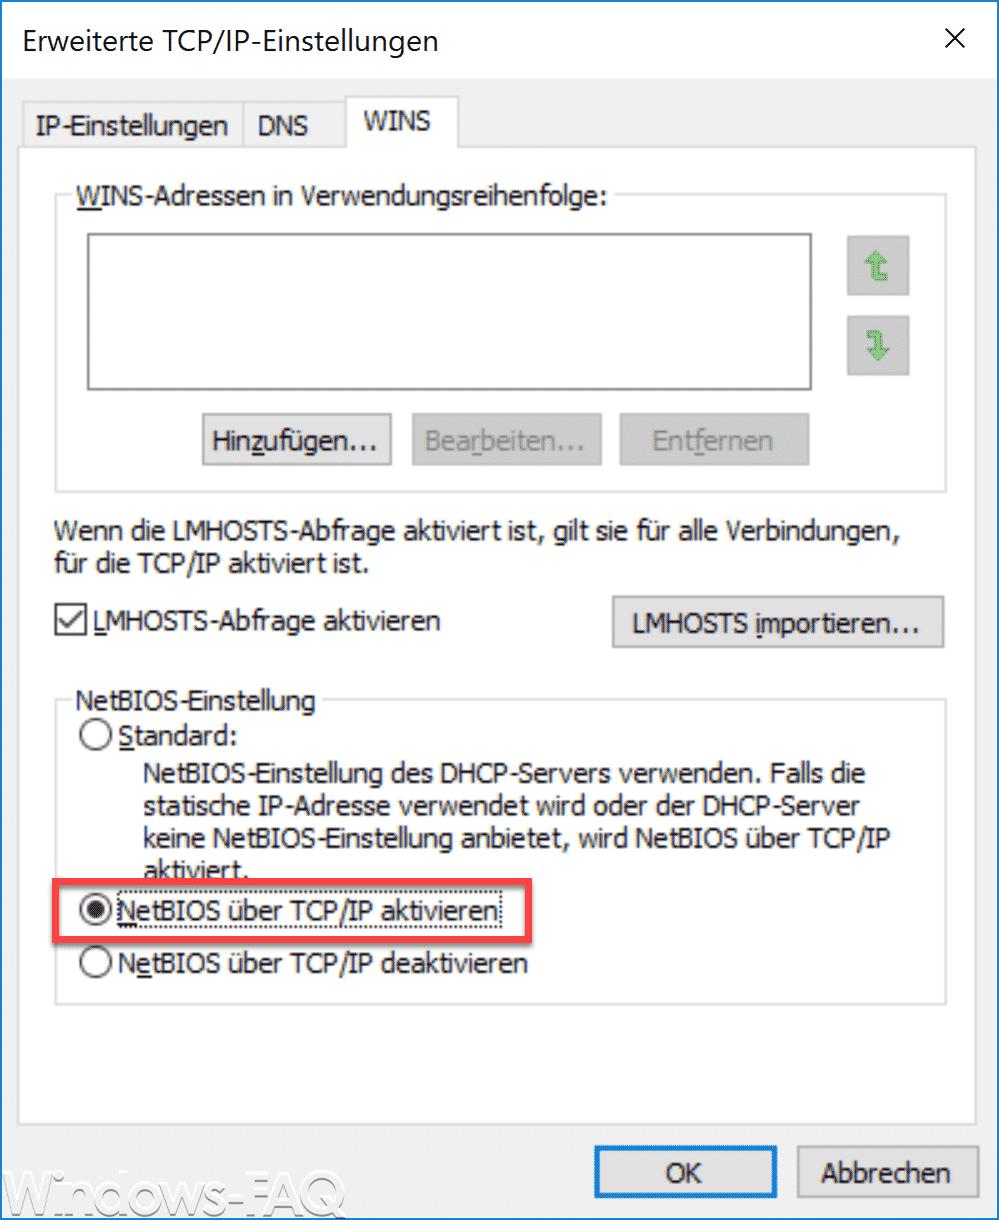 NetBIOS über TCP/IP aktivieren